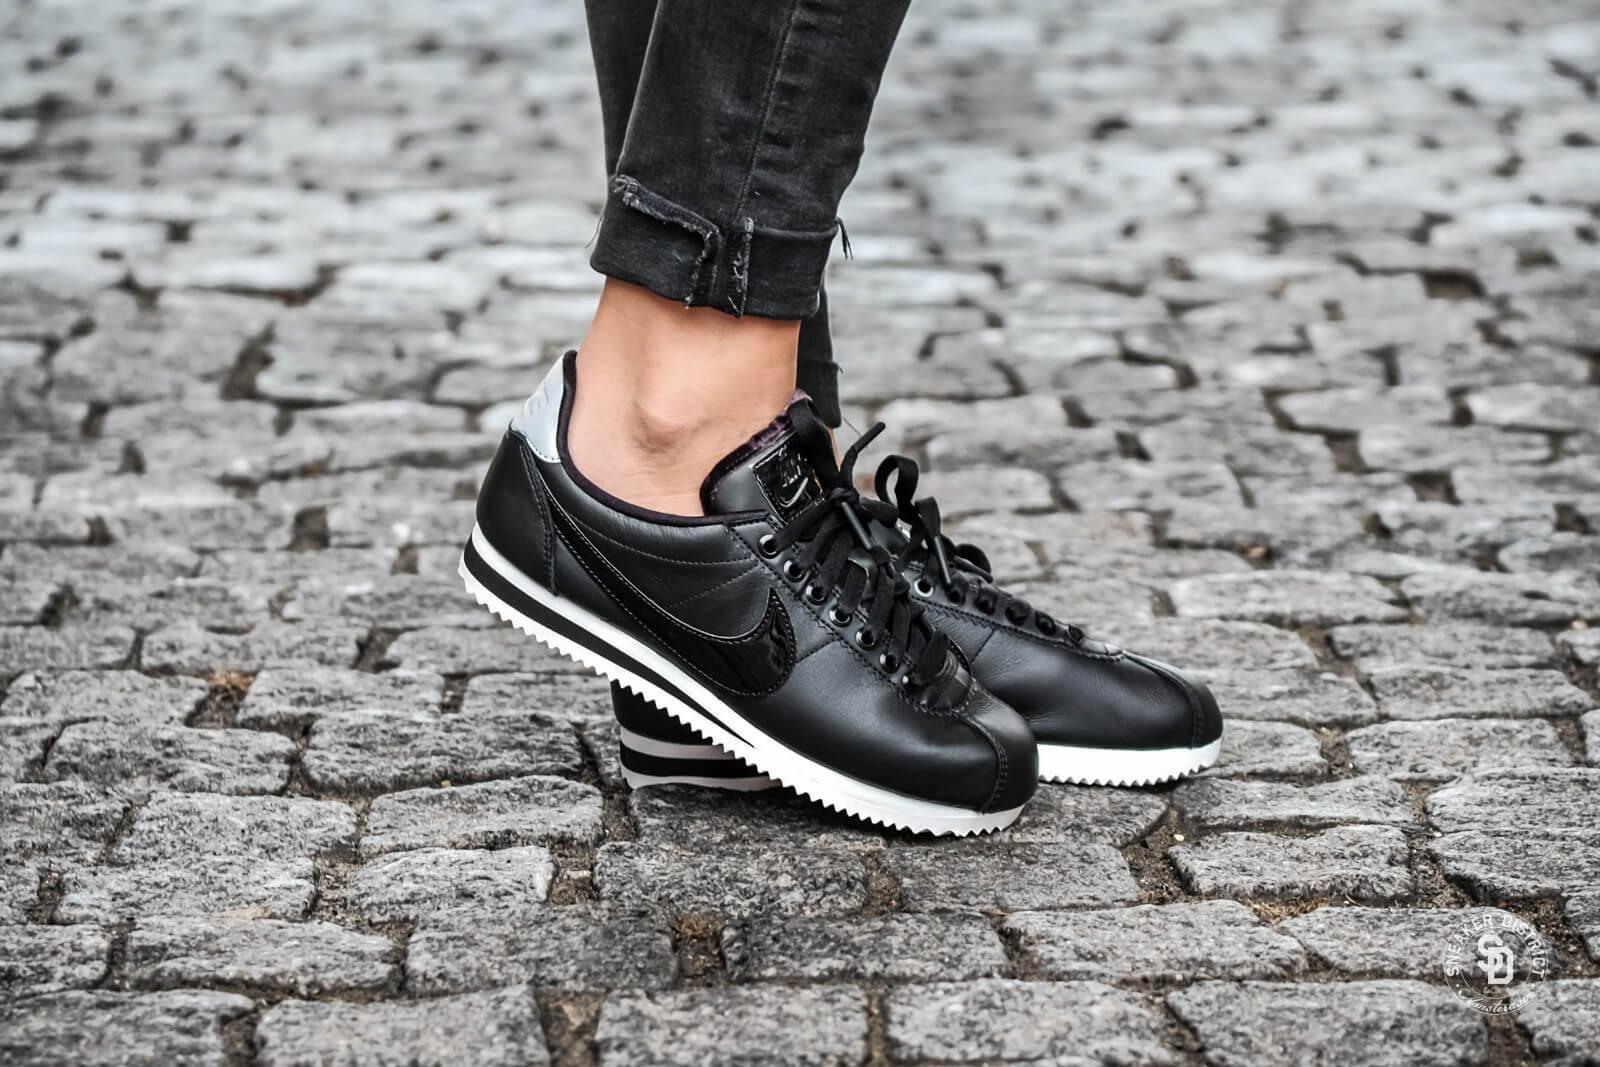 Competidores piloto ~ lado  Nike 'Beautiful x Powerful' Women's Classic Cortez SE Premium Black/Reflect  Silver-Cool Grey - AJ0135-001